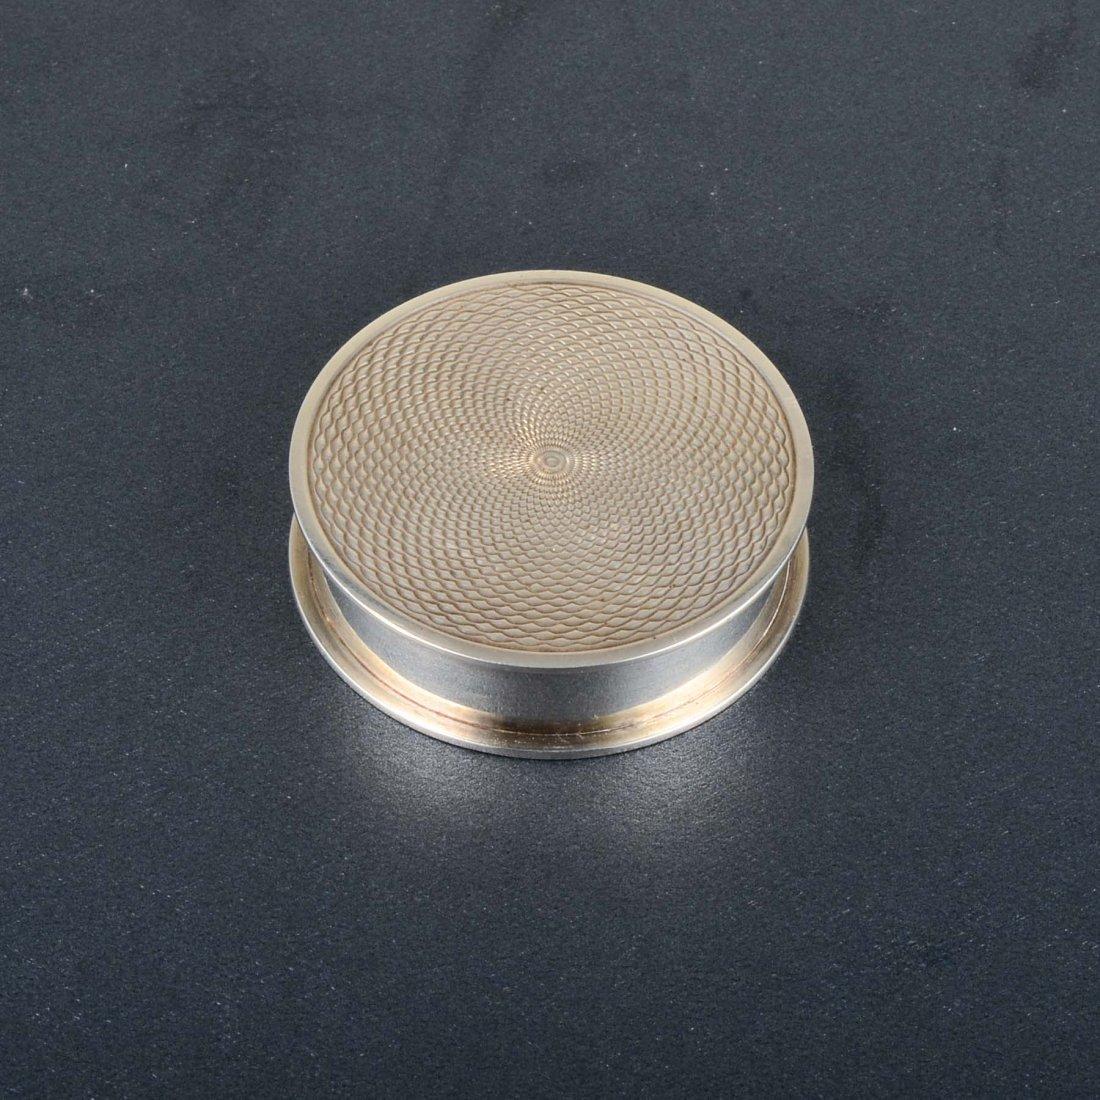 Hermes Silver Pillbox - 3